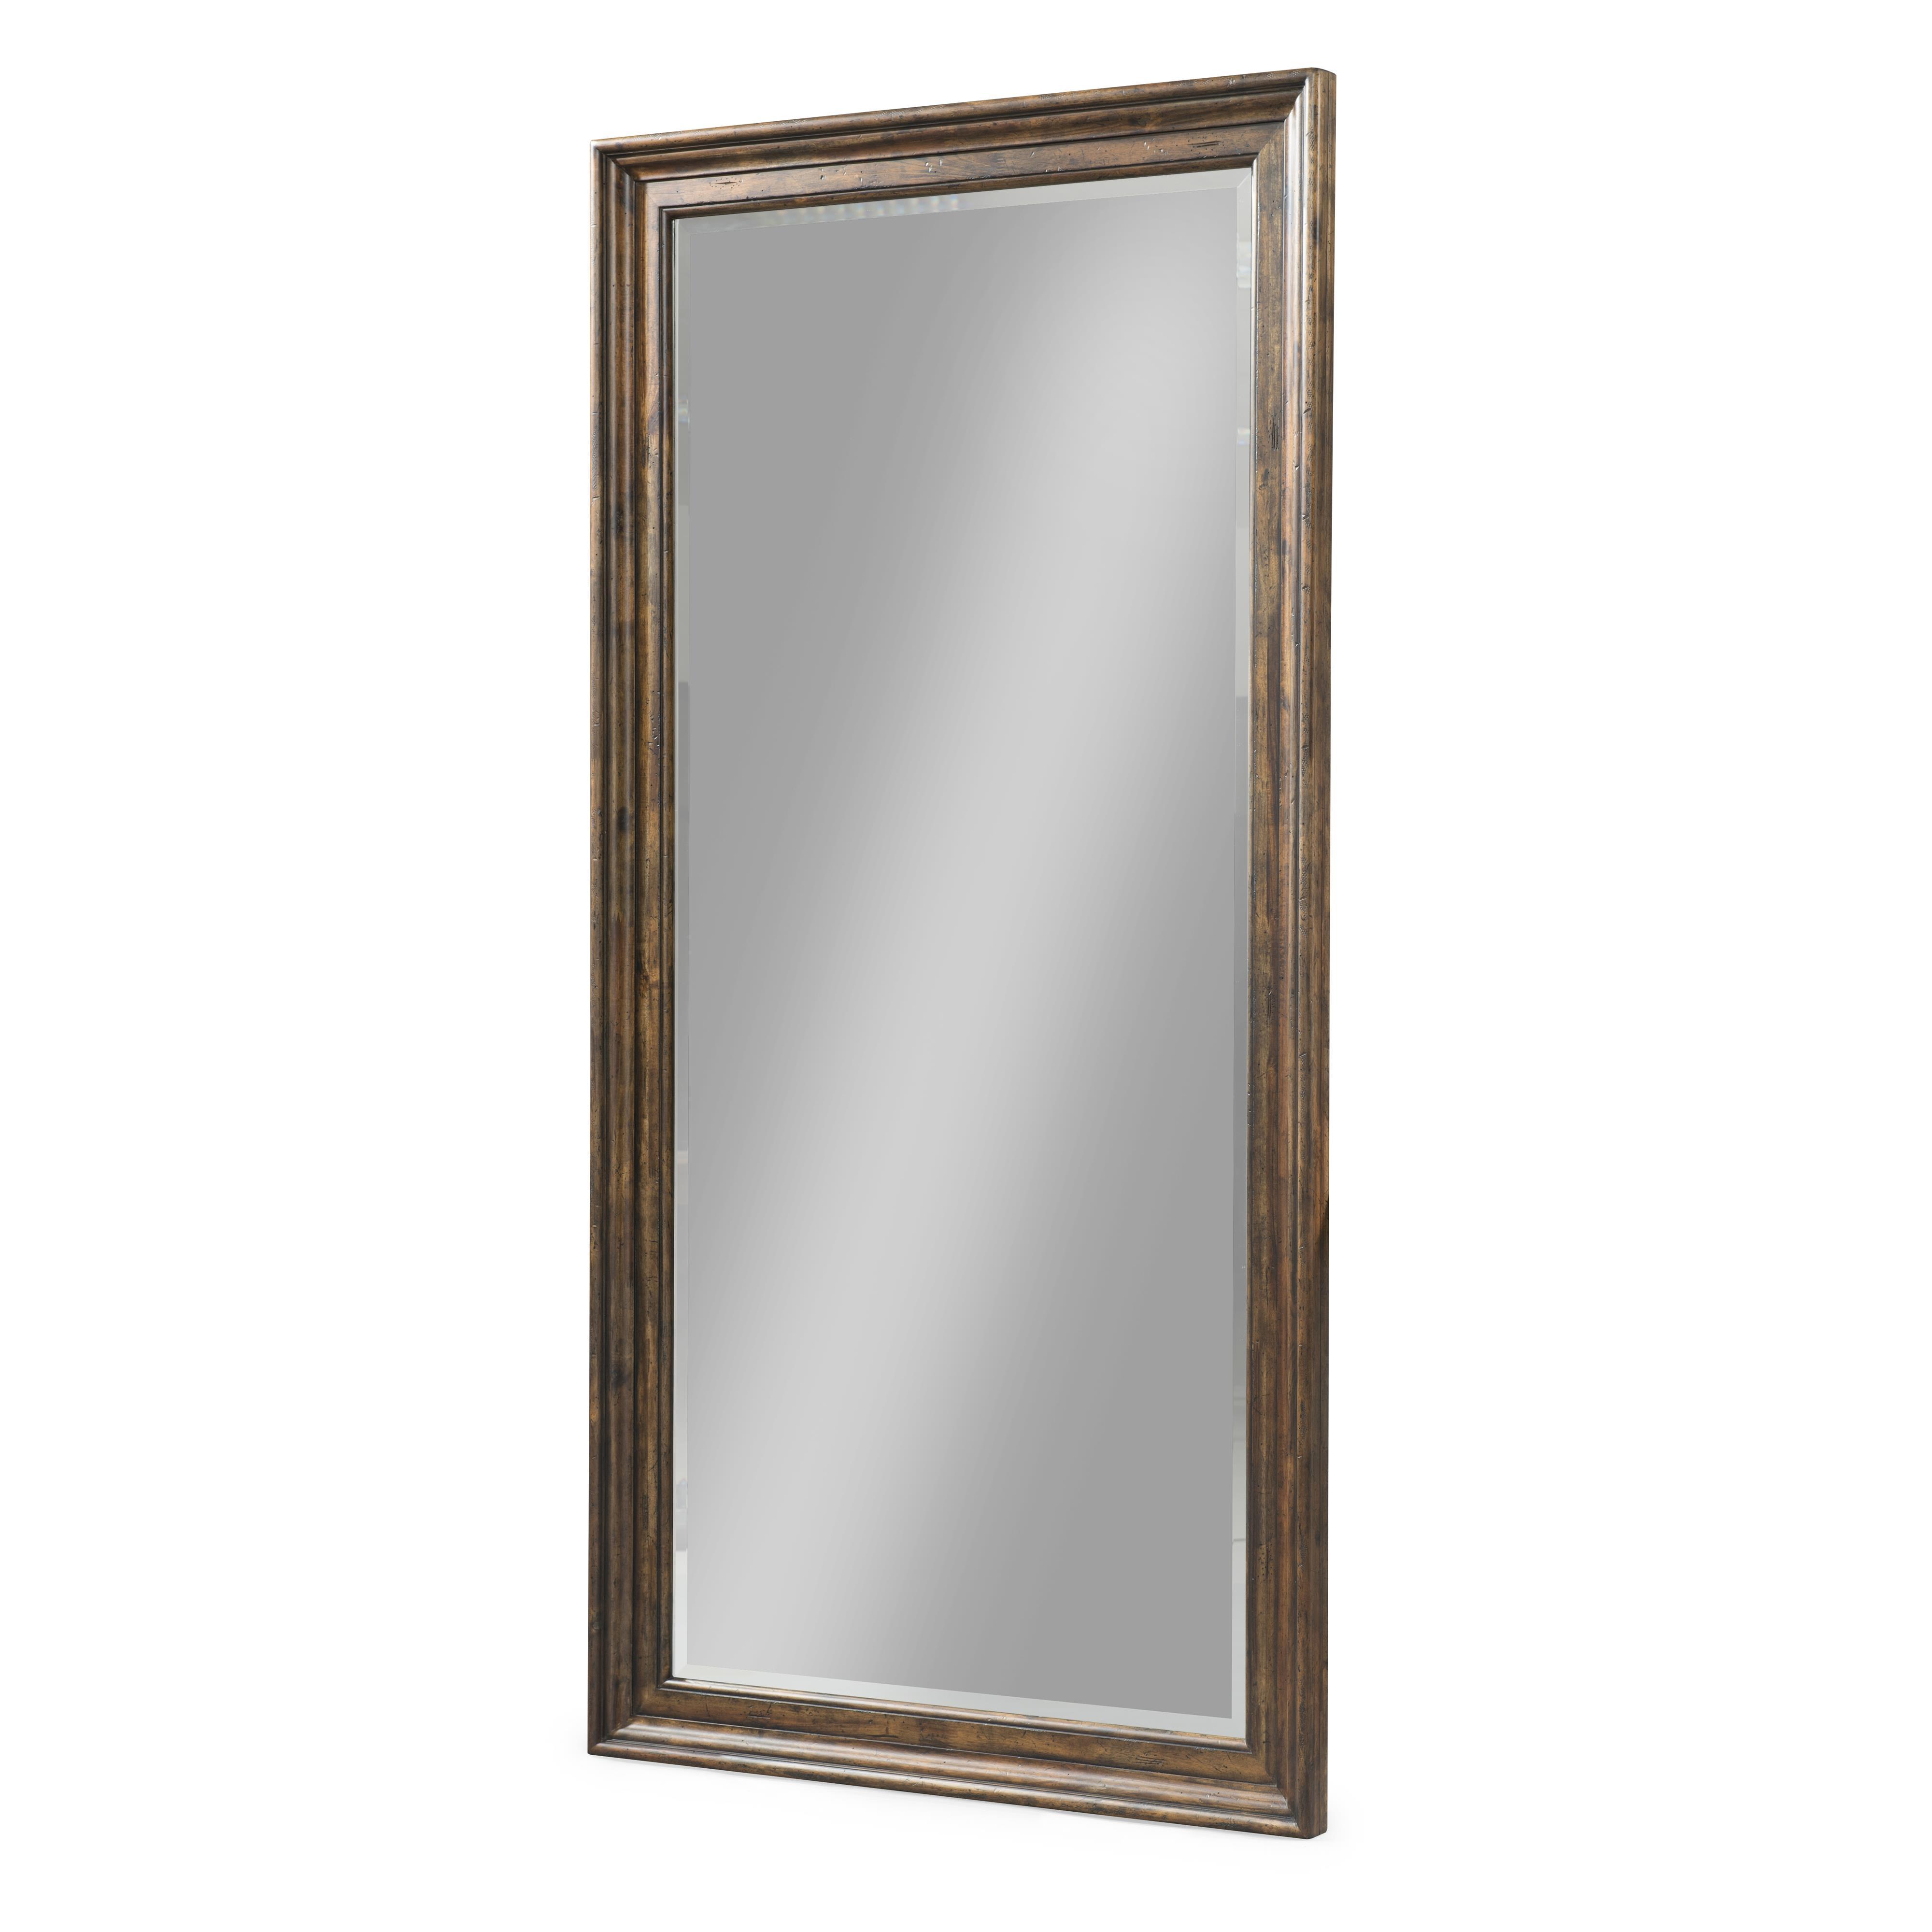 In My Reflection Floor Mirror